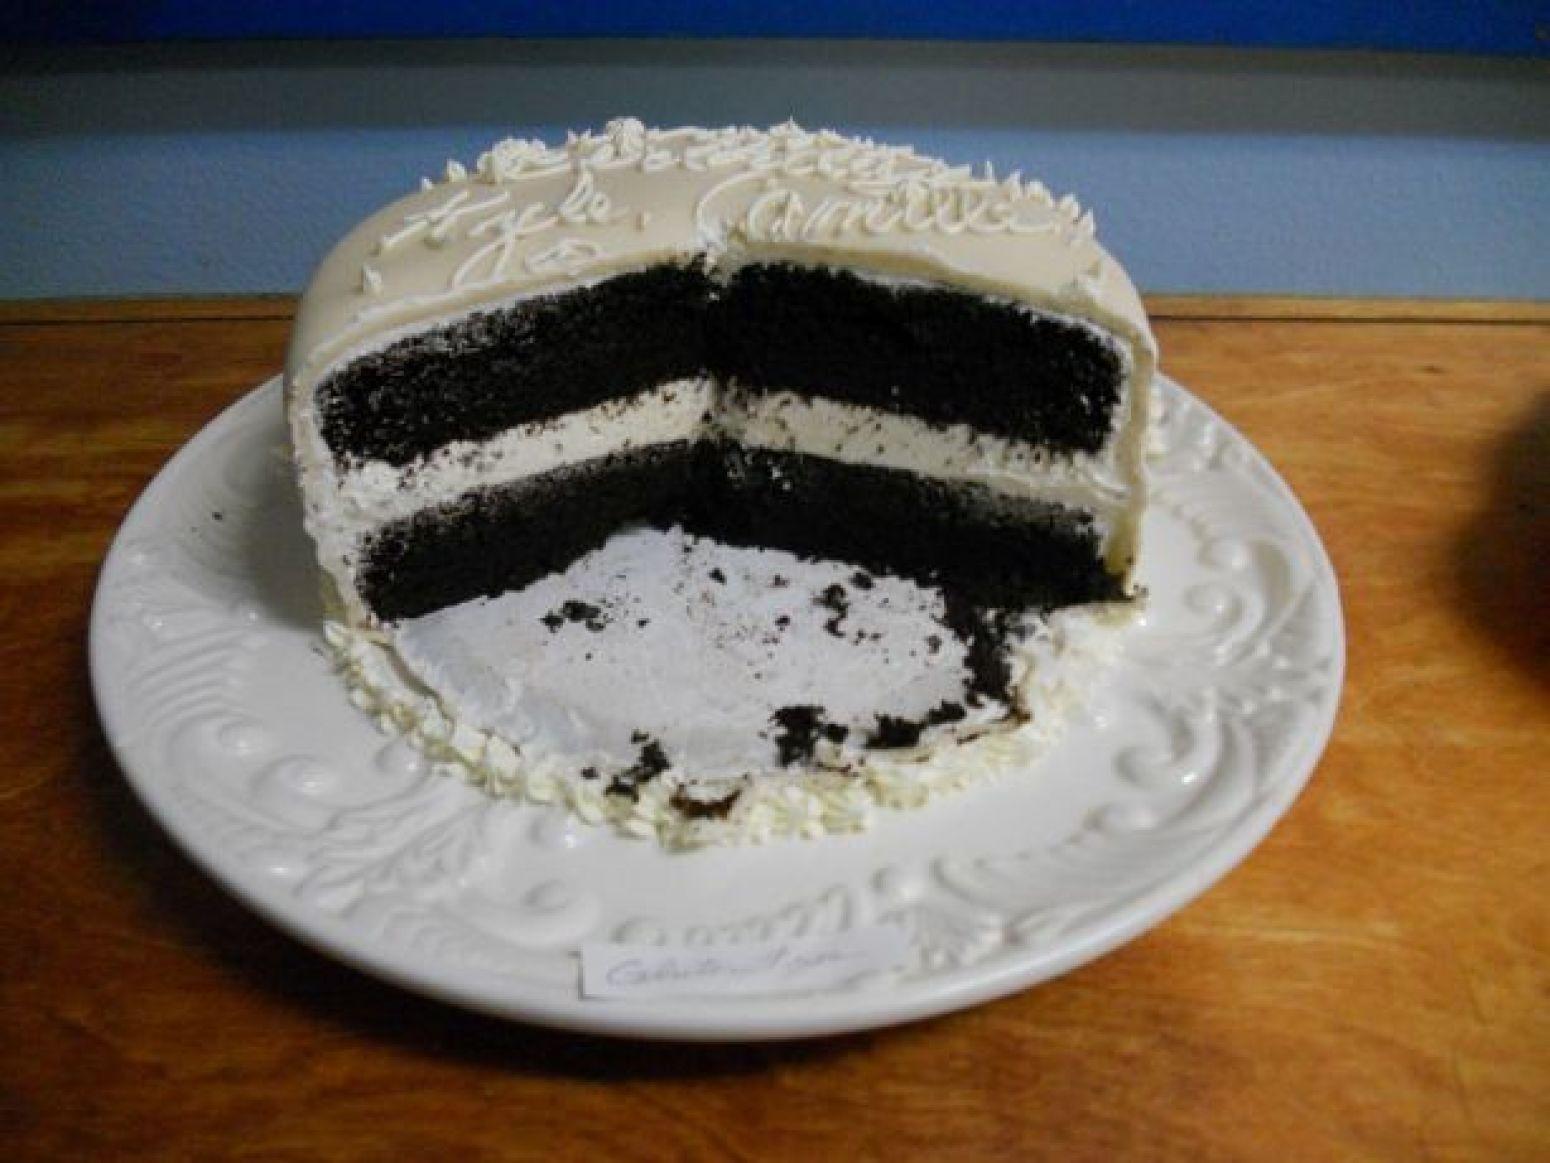 Hershey's Perfectly Chocolate Chocolate Cake Recipe 6 | Just A Pinch ...